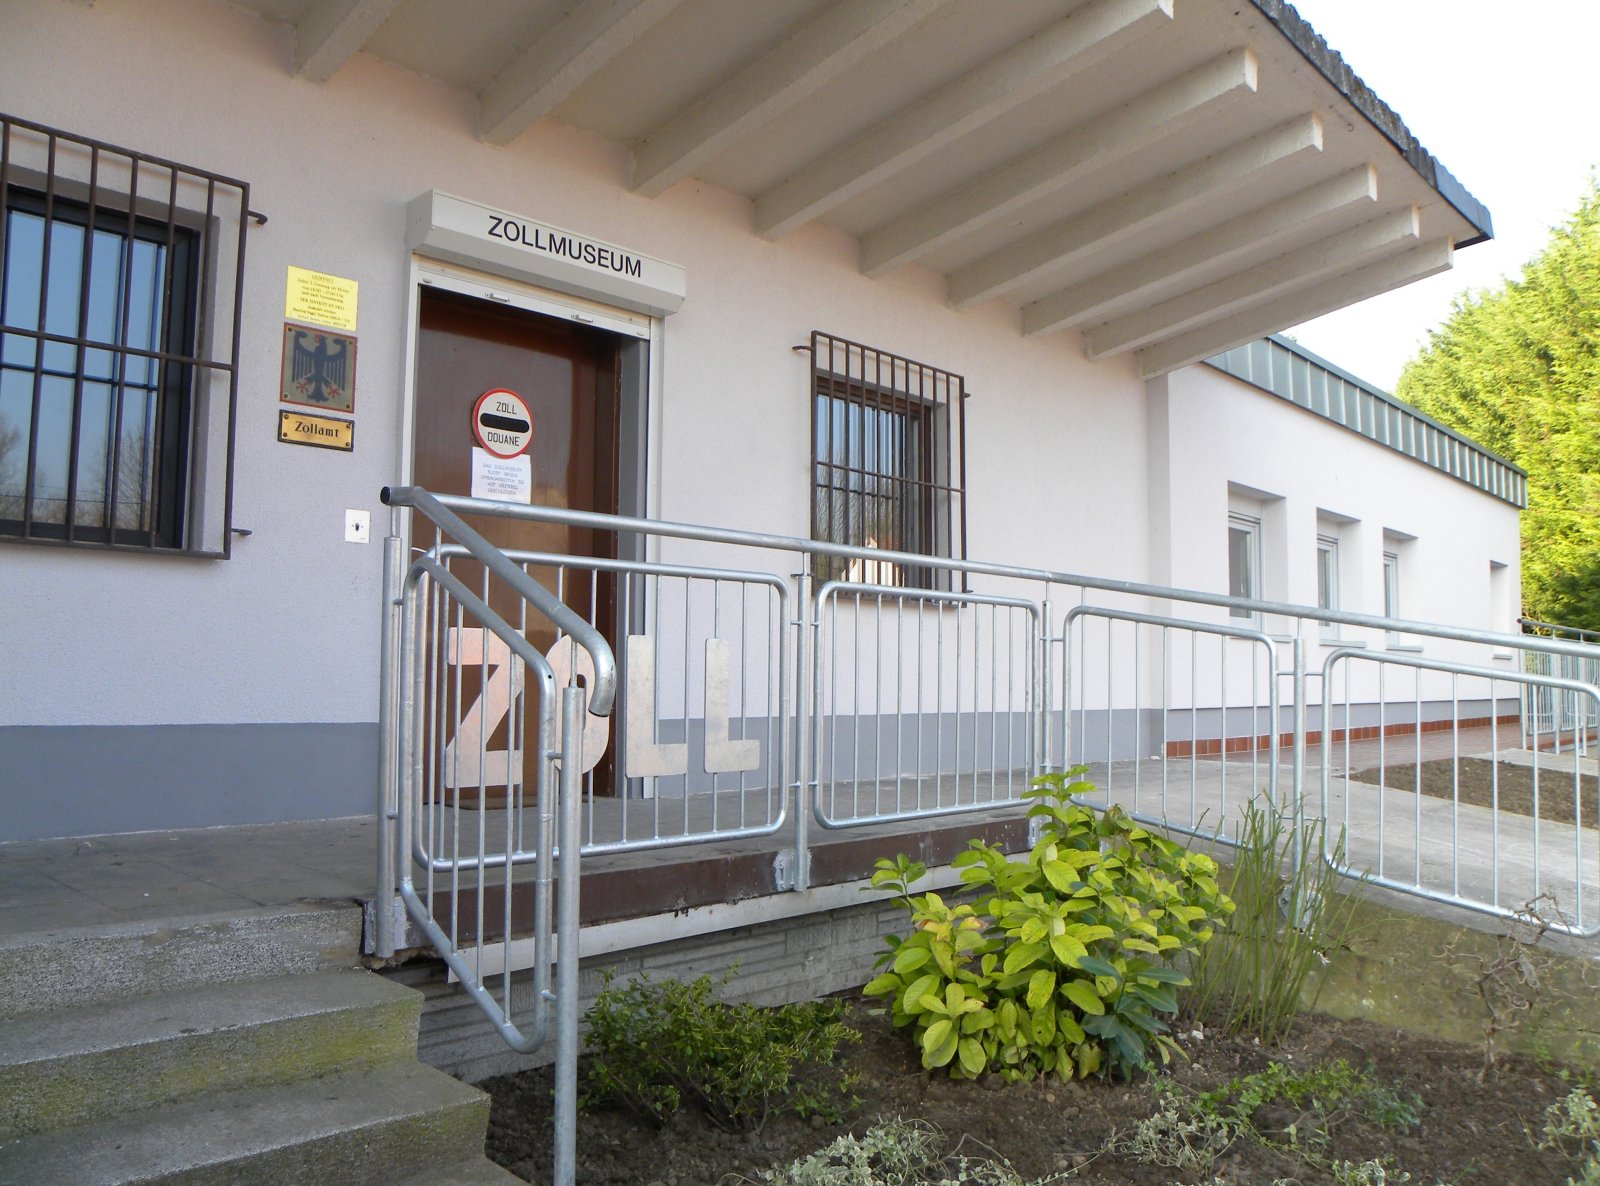 DDR-Ecke Zollmuseum